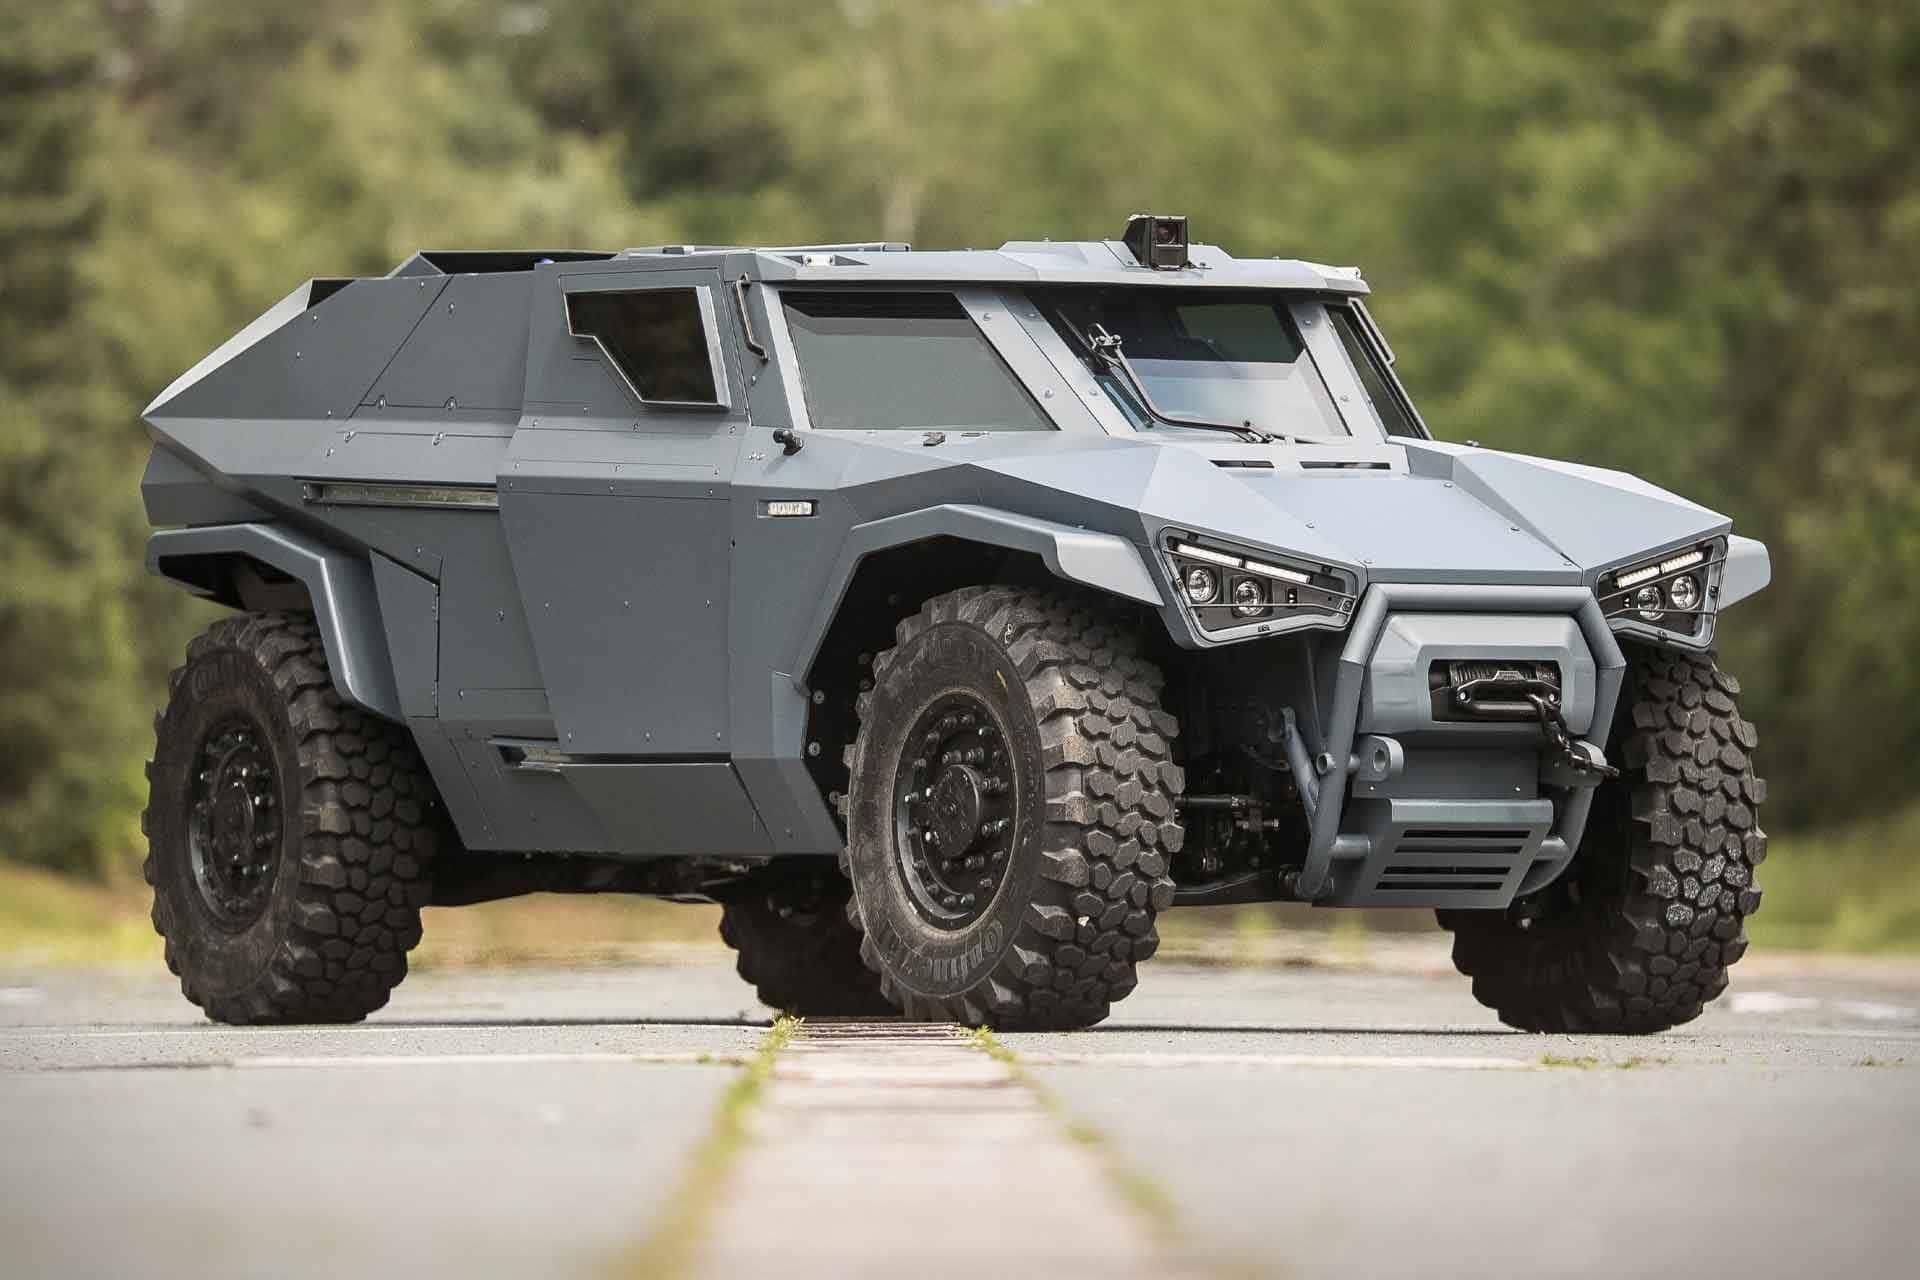 Arquus Scarabee Armored Vehicle